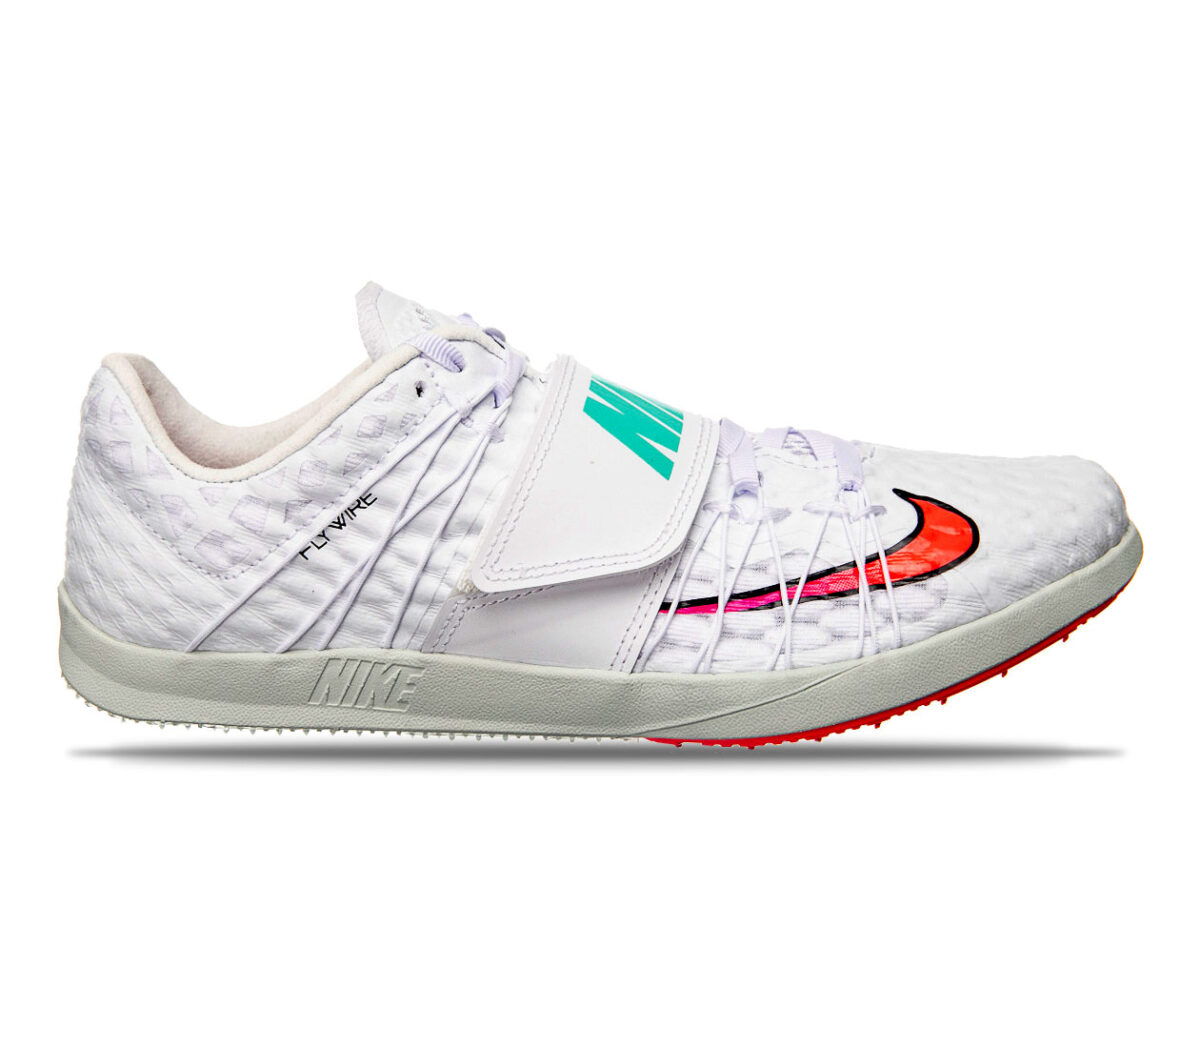 scarpa atletica salto triplo unisex nike triple jump elite bianca